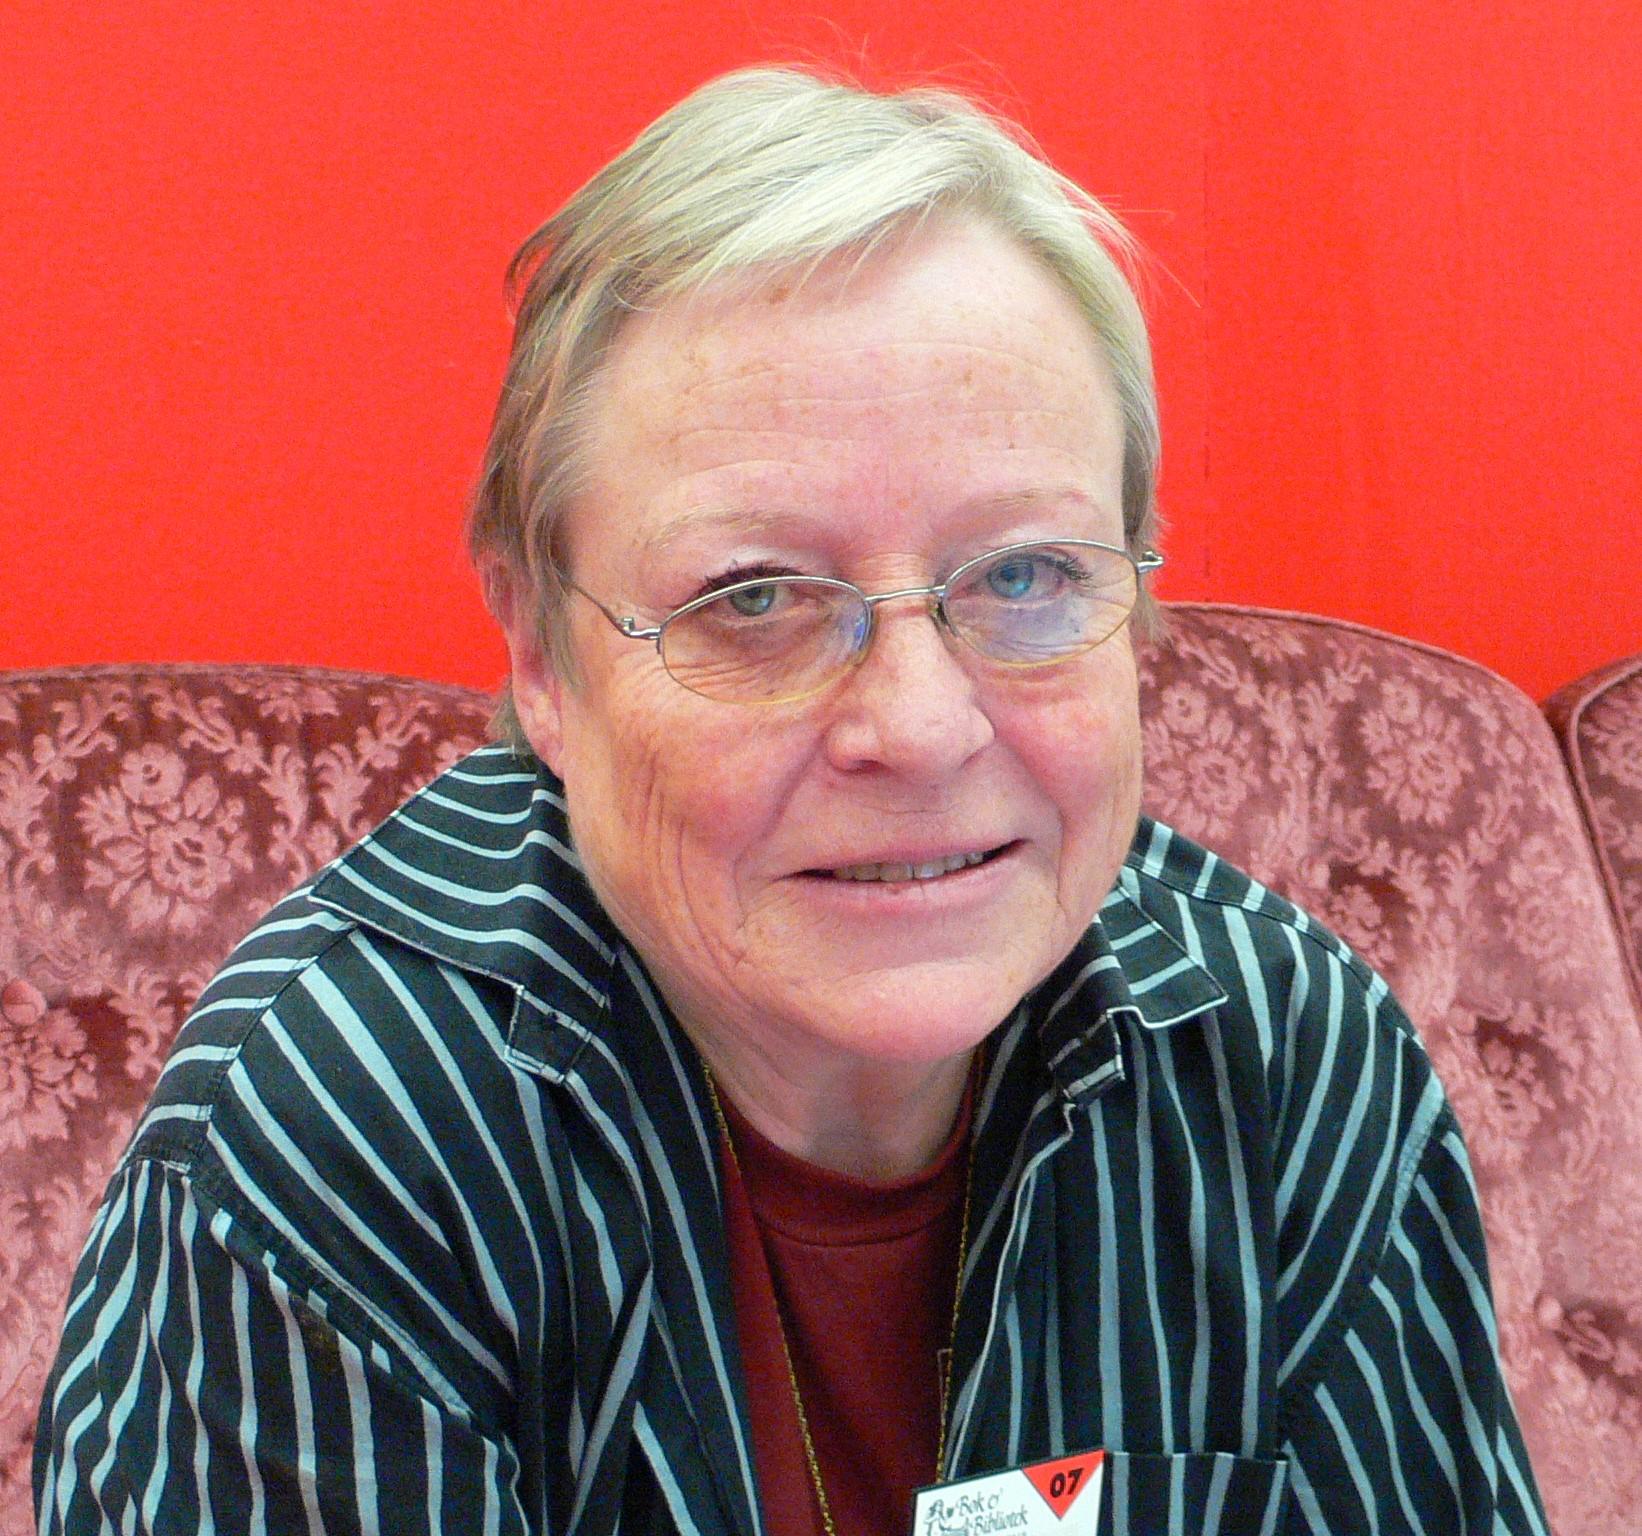 Yrsa Stenius at the Gothenburg Book Fair, 2007 (Wikimedia Commons, Hannibal)